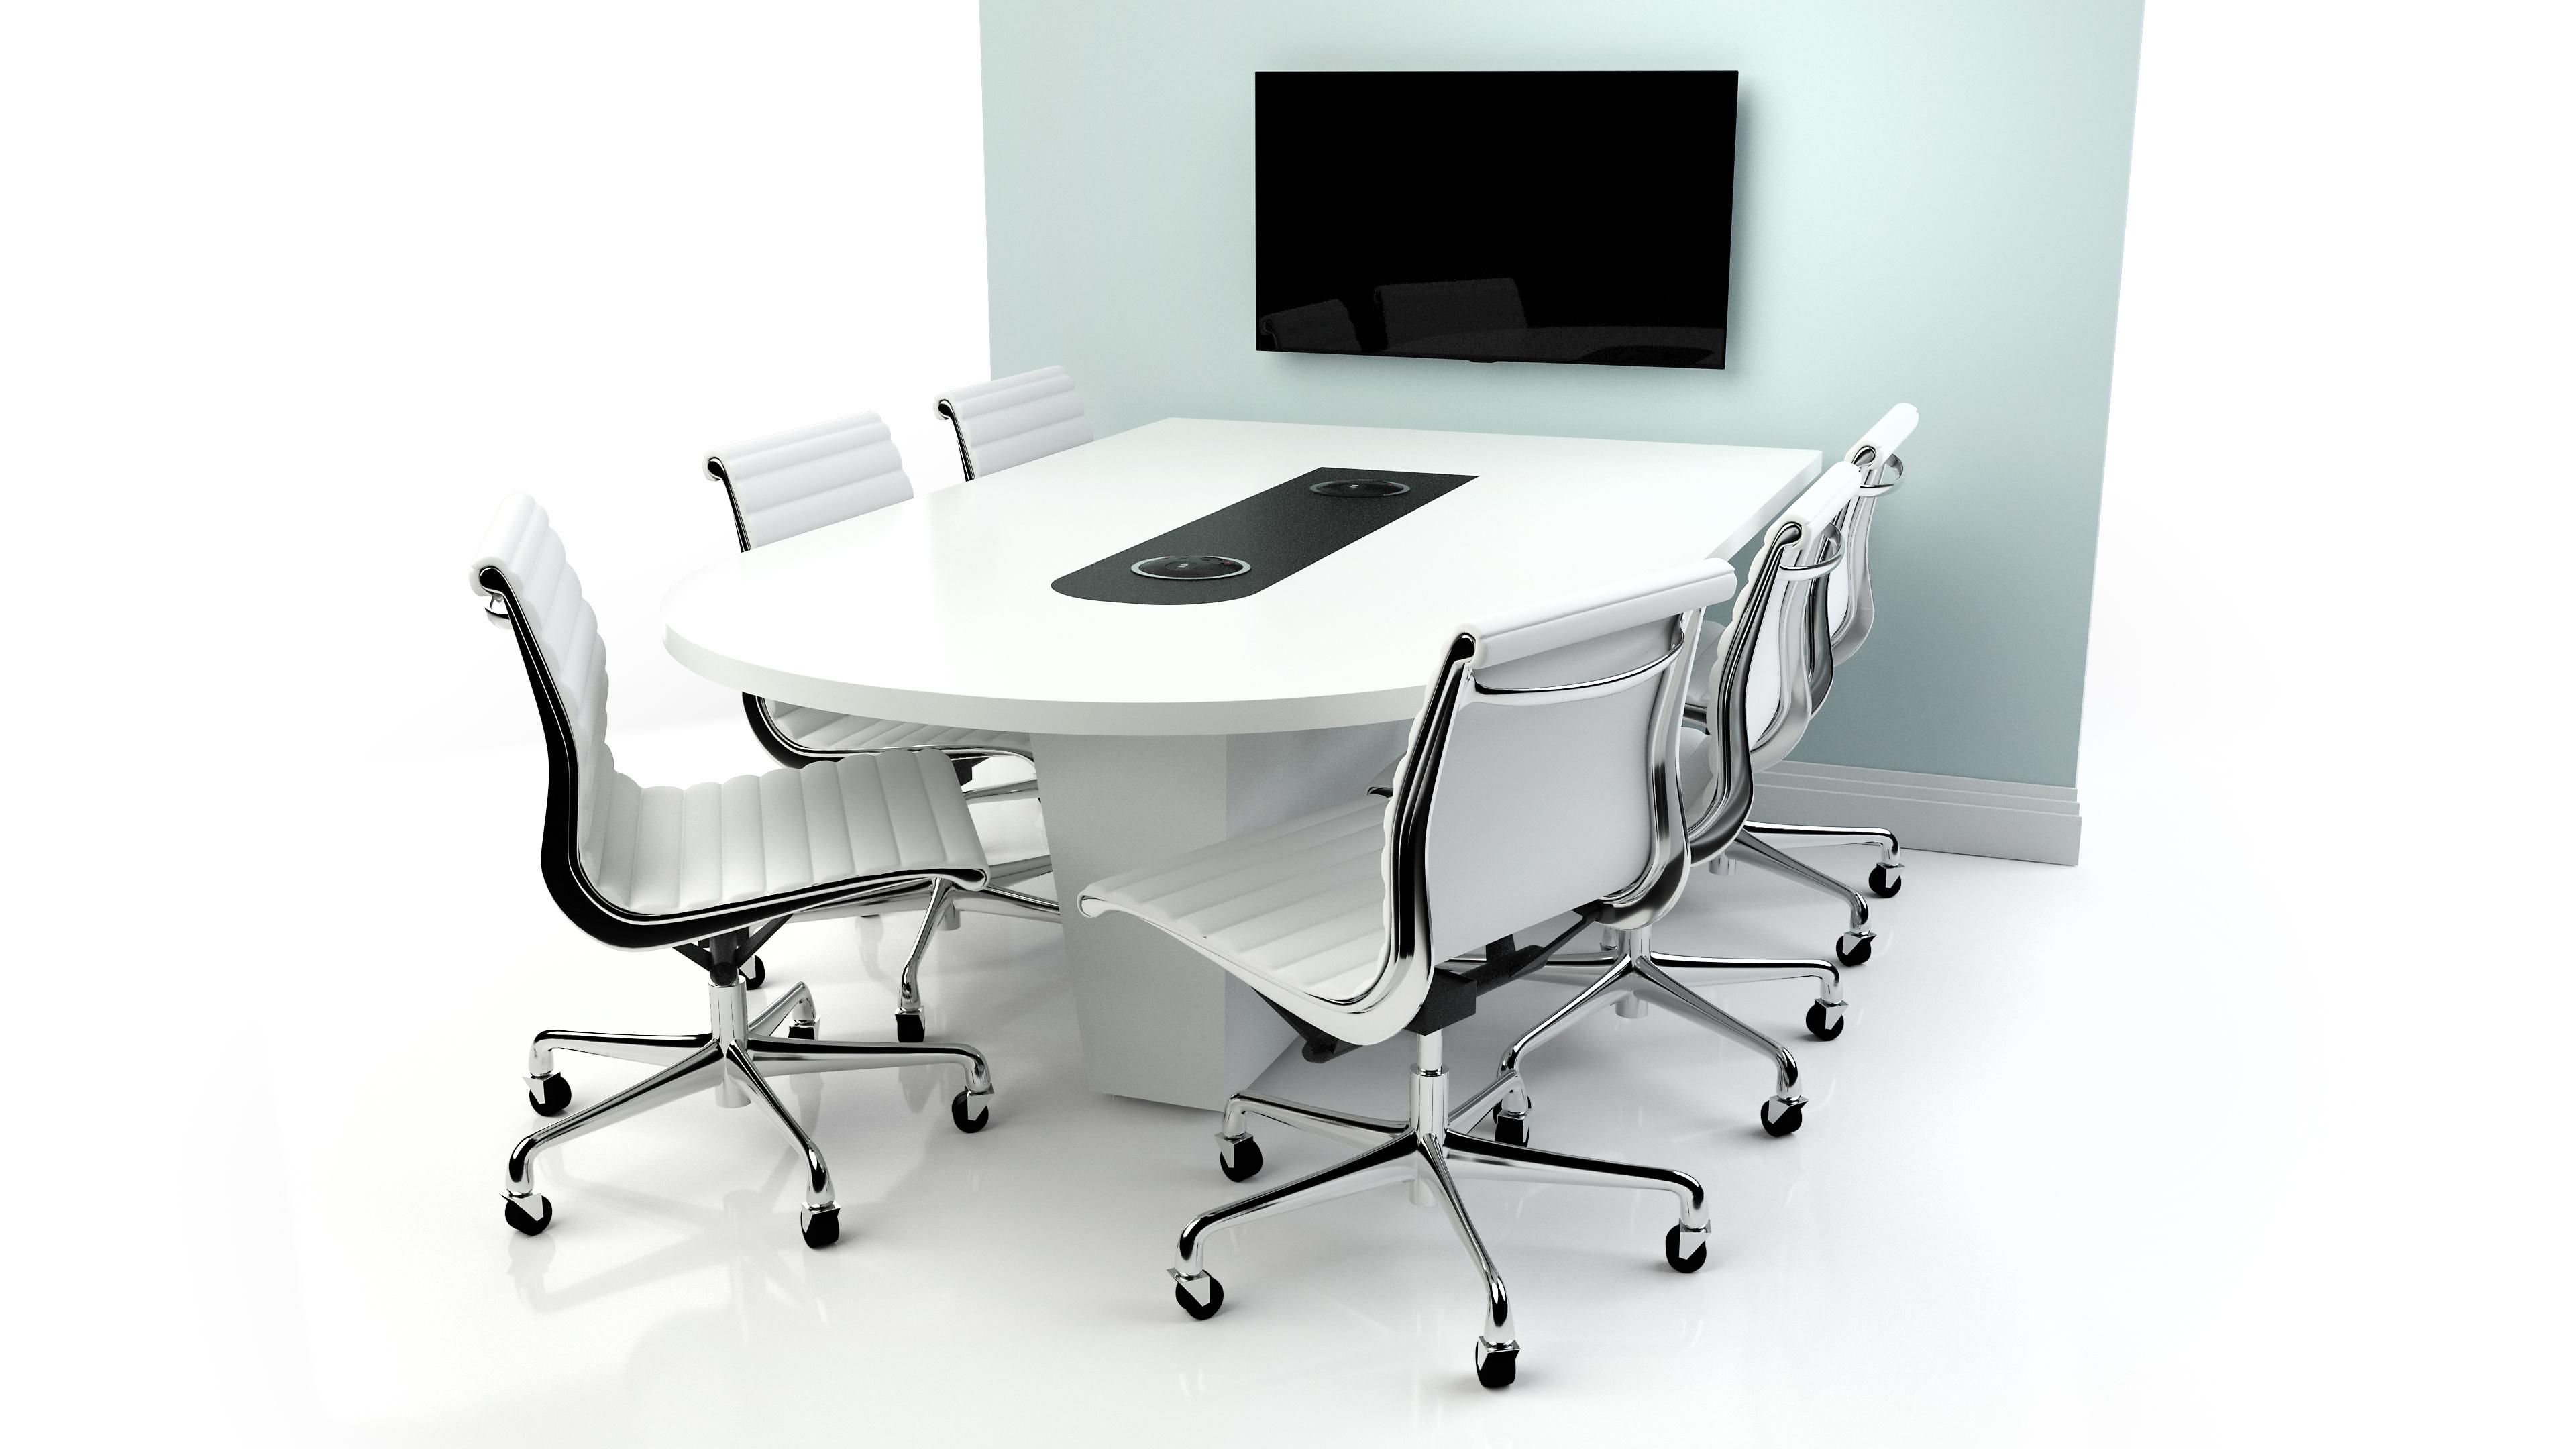 Collaborative Furniture Turning Leaf Launches New Huddle Desks